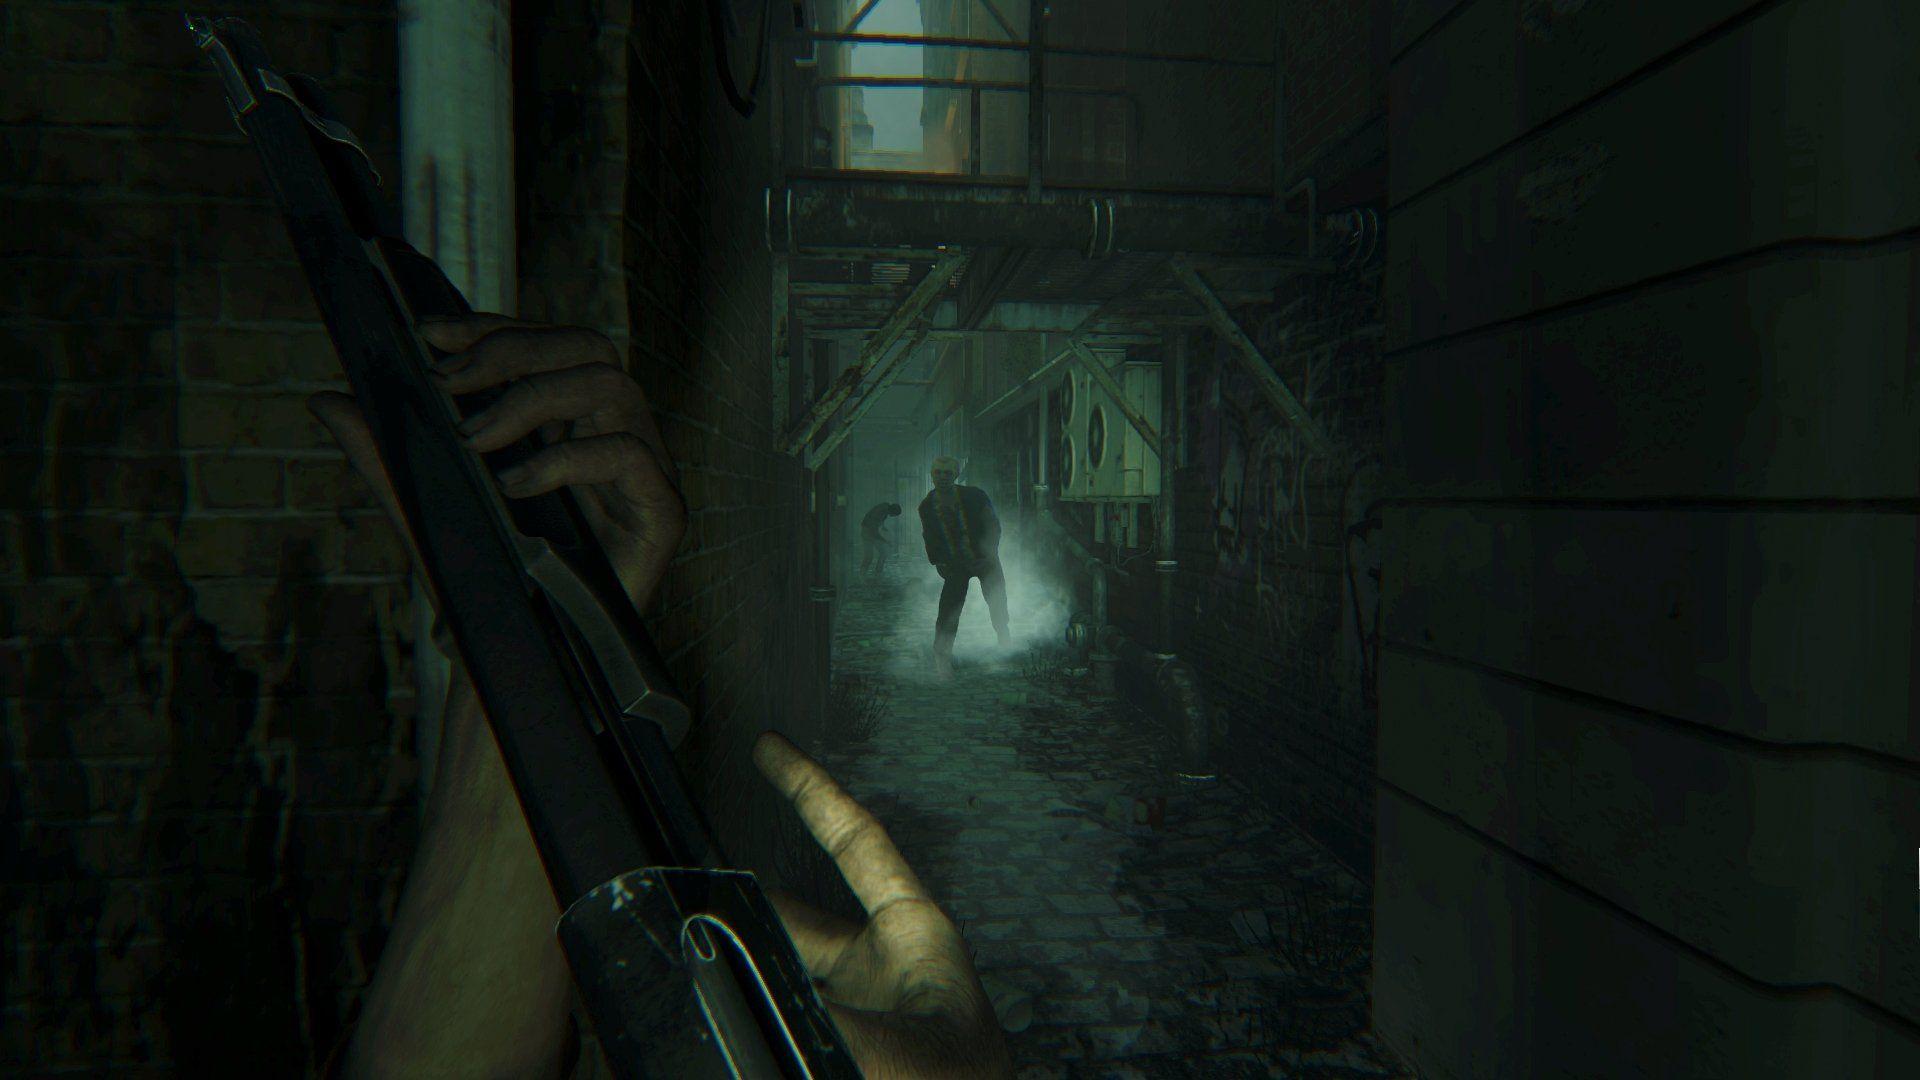 ZOMBI ZombiS Zombies SurvivalHorror PlayStation4